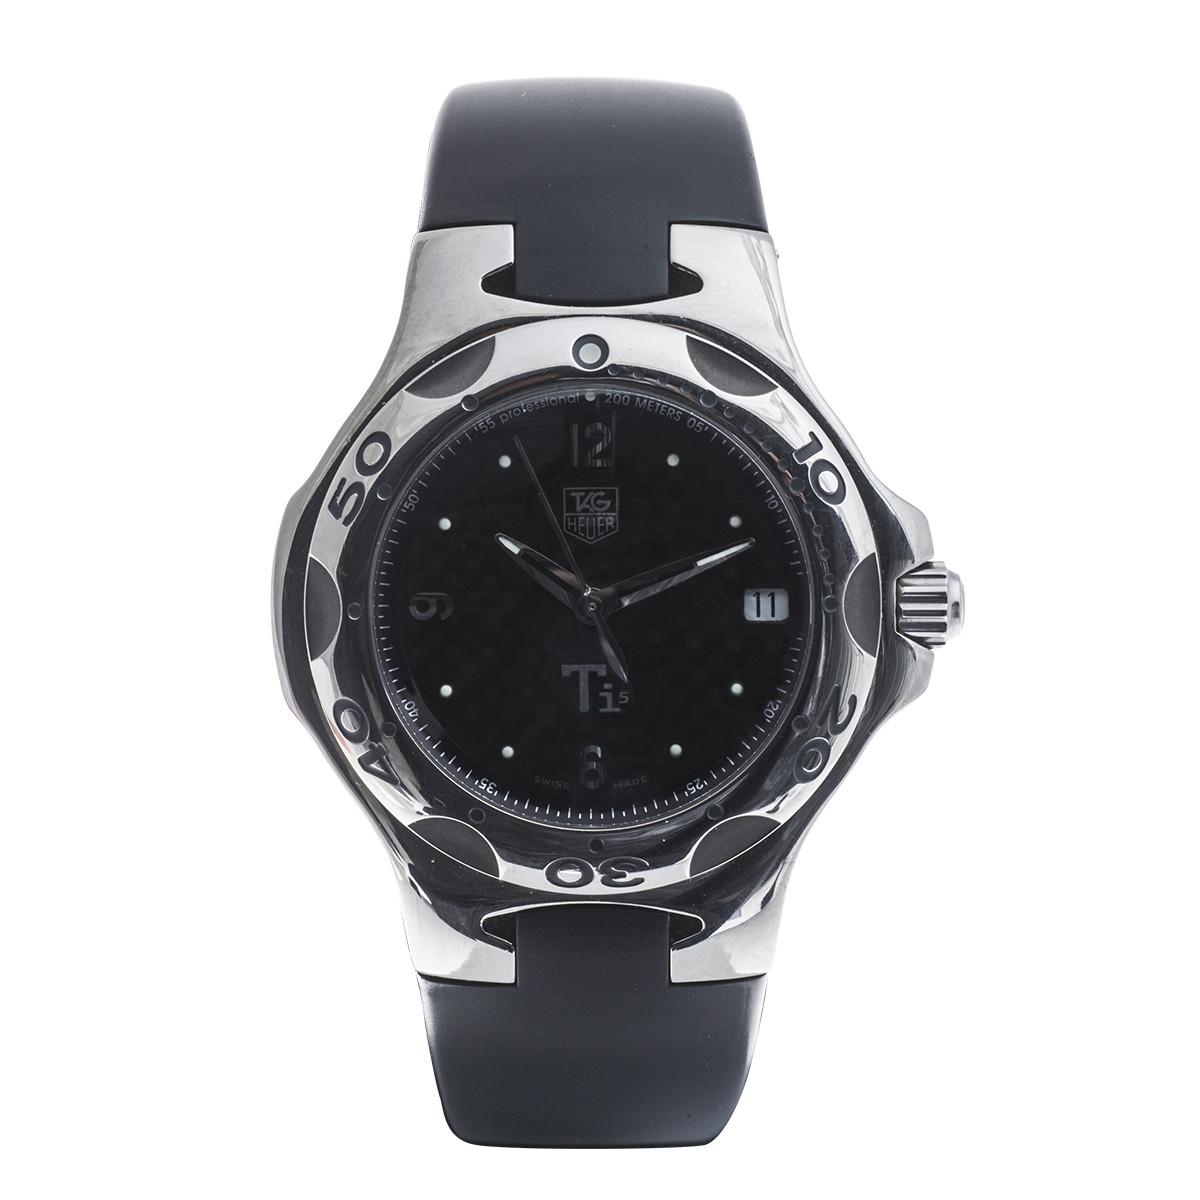 Preowned Tag Heuer Kirium Watch